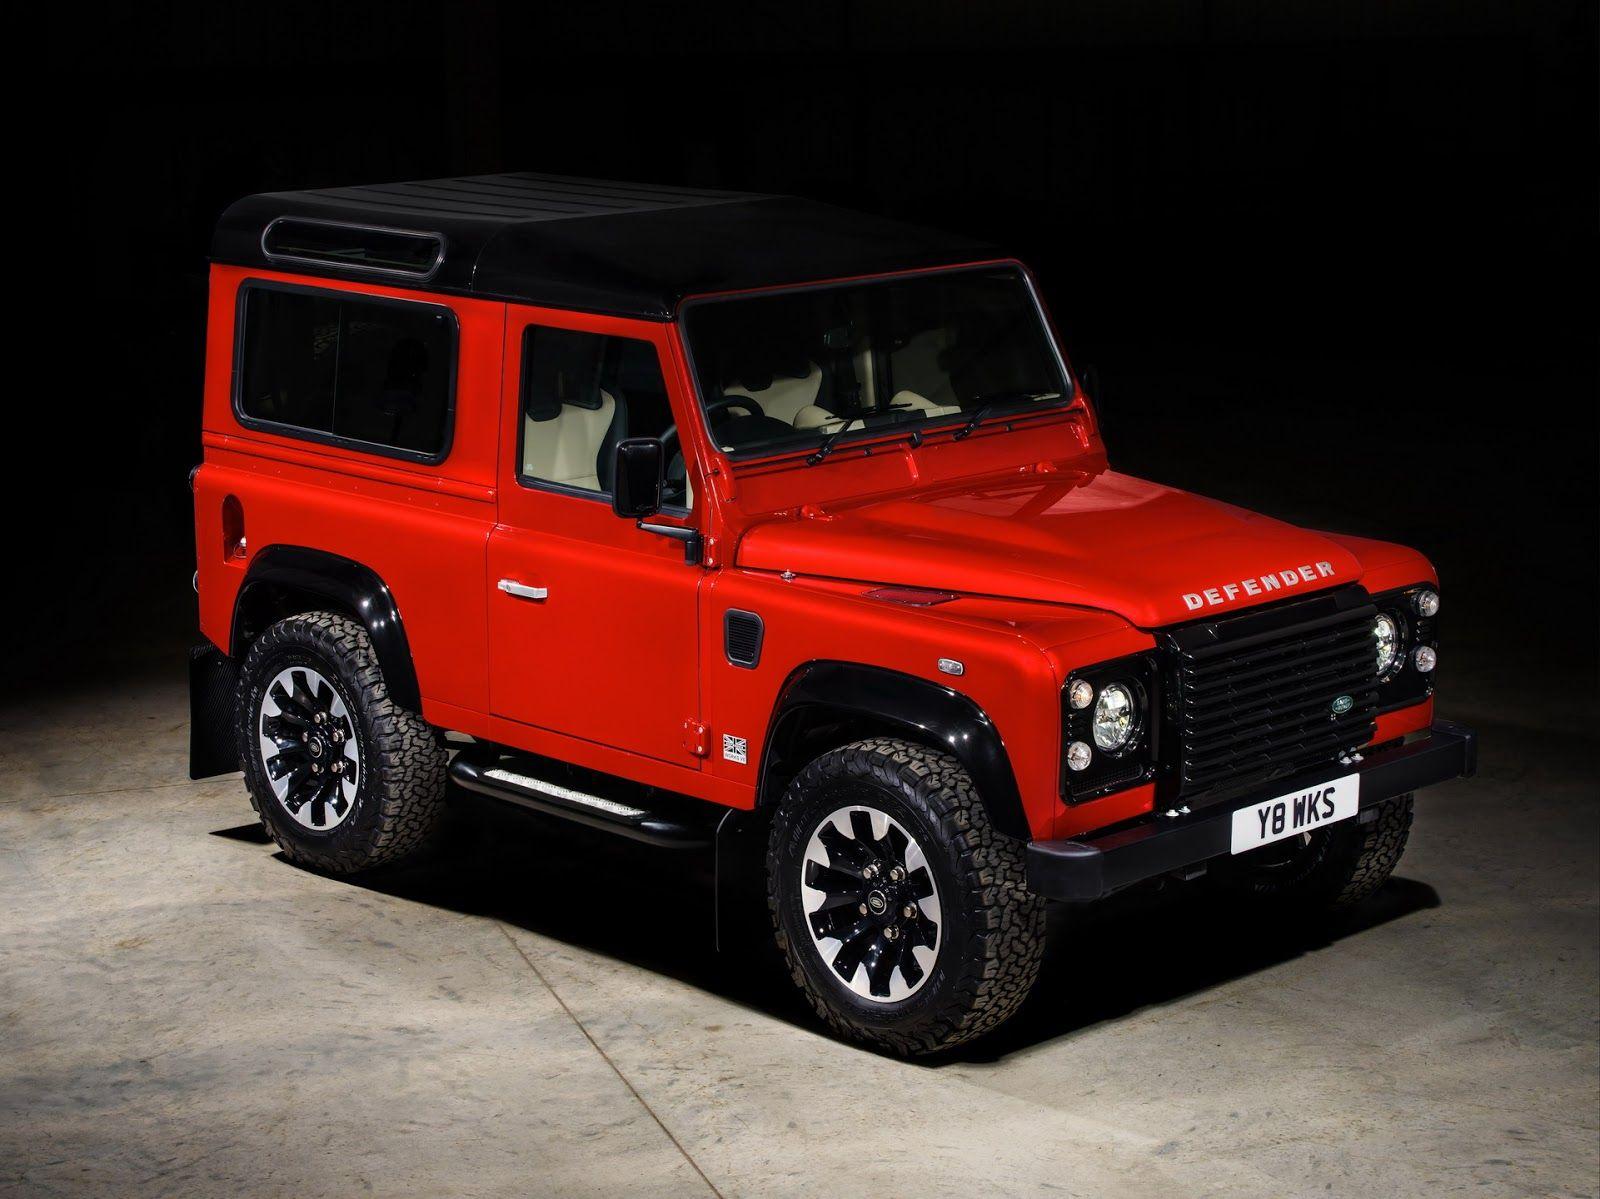 Original Land Rover Defender Returns With 400hp V8 Special Edition